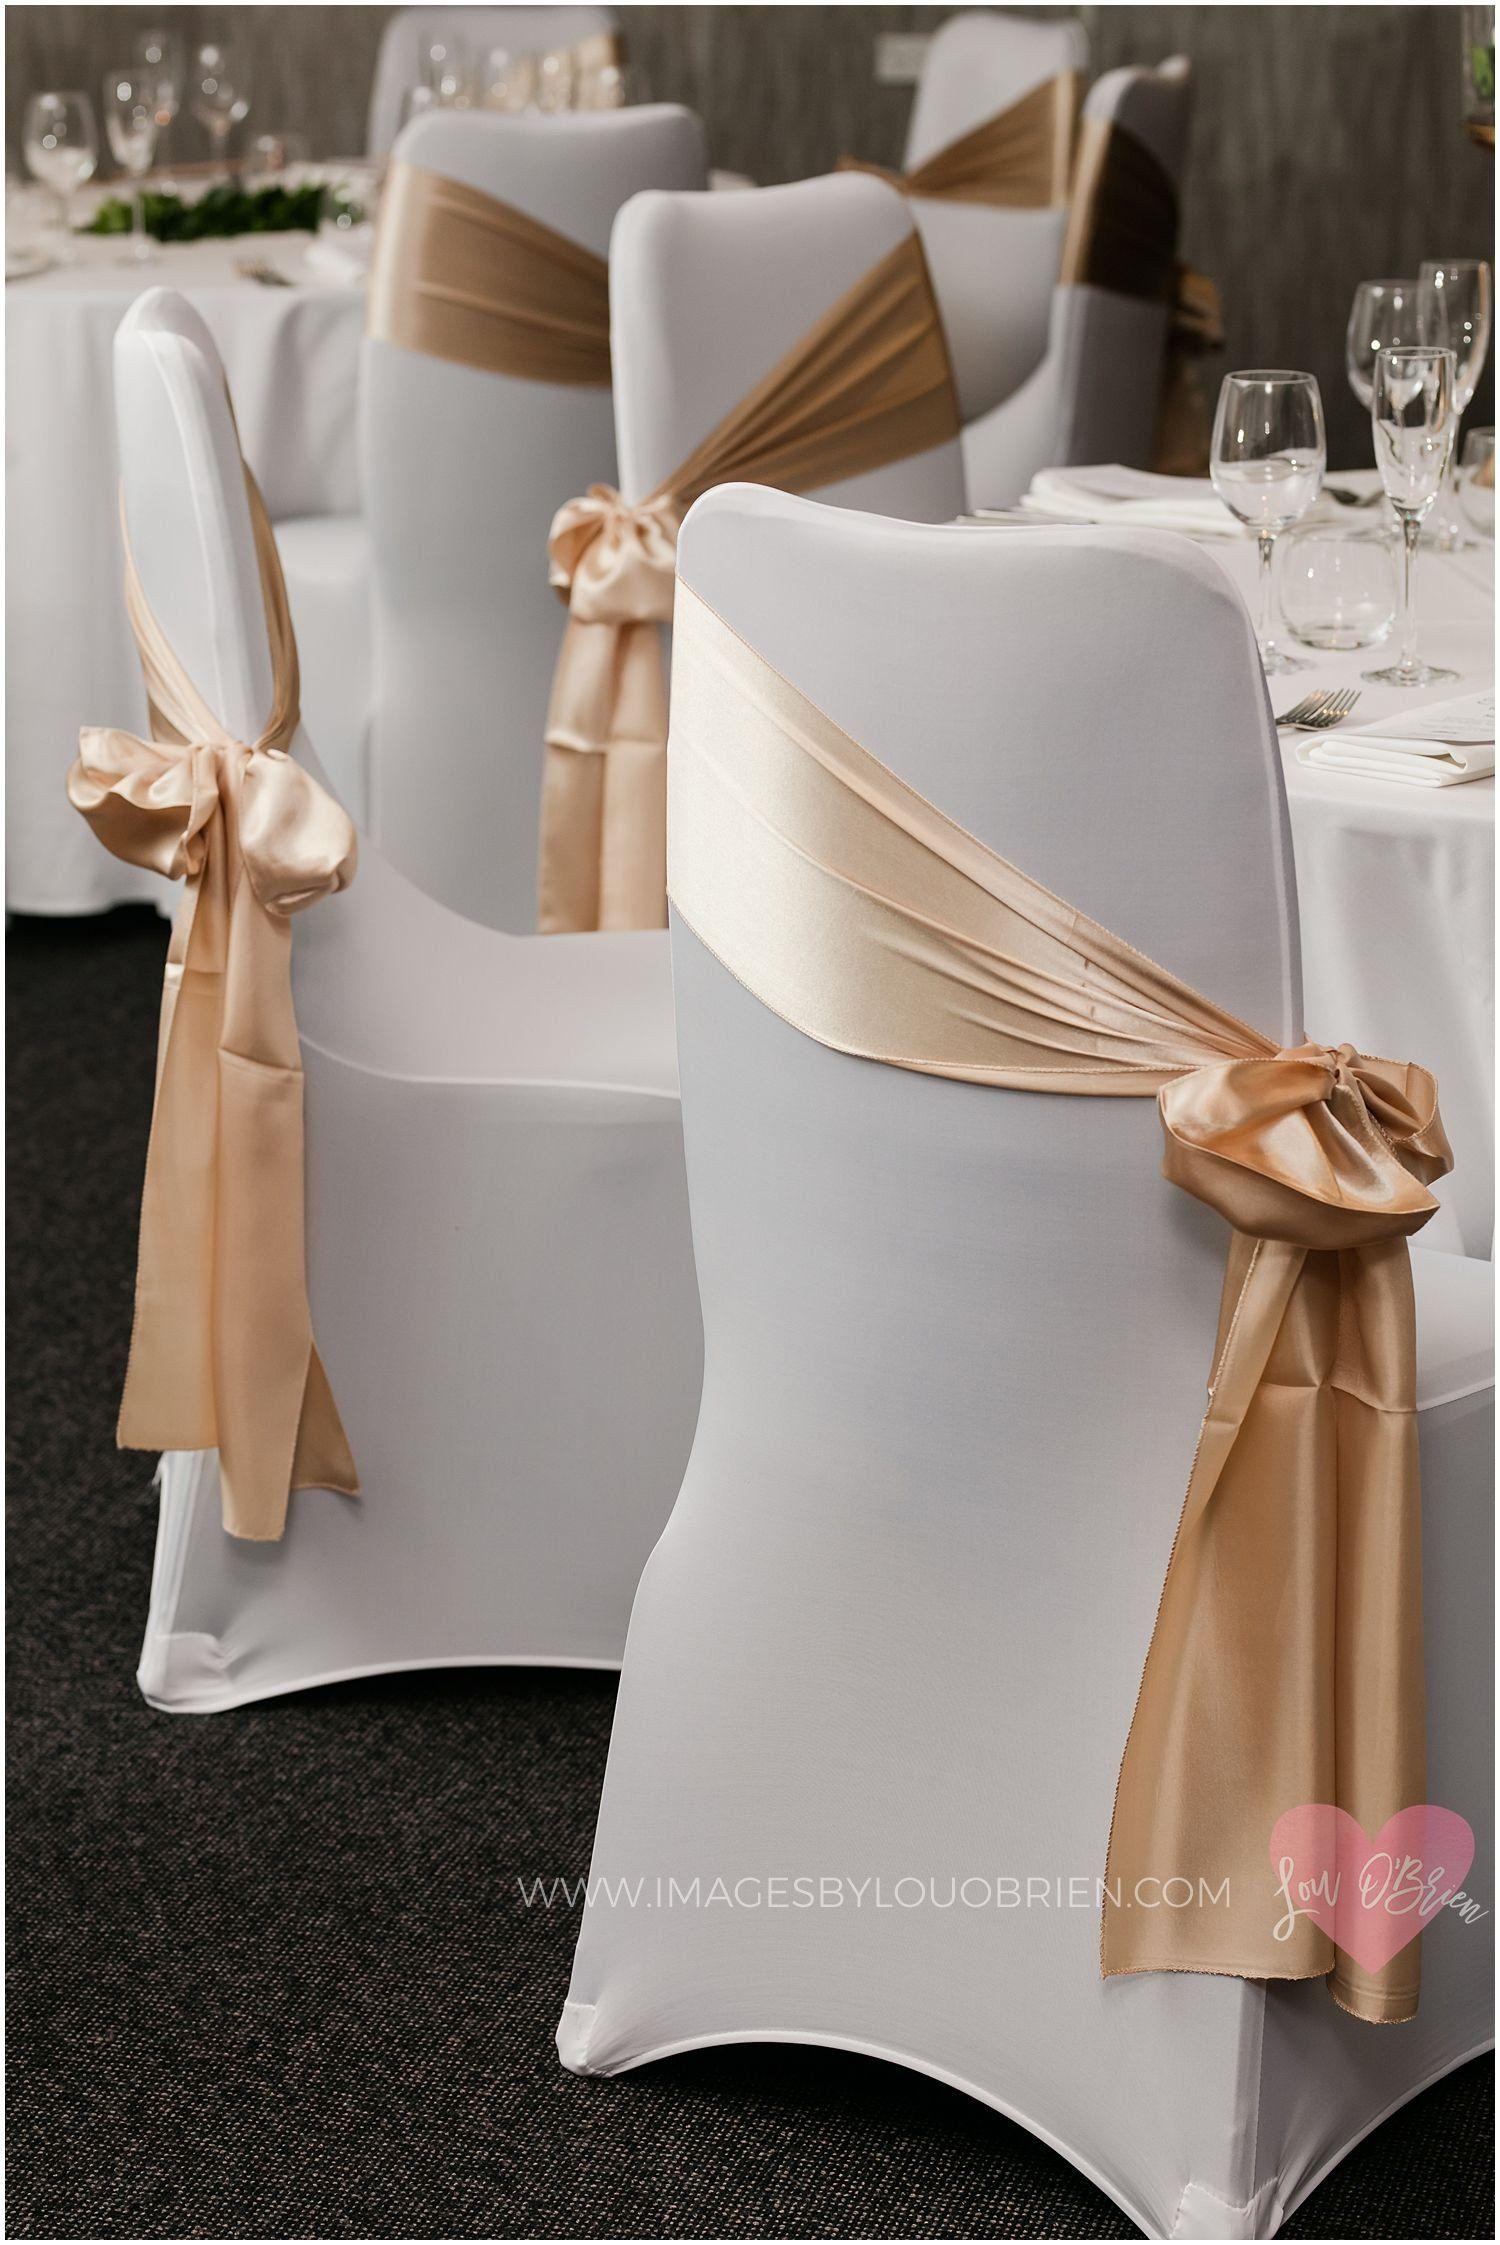 50th Wedding Anniversary Decoration Ideas Best Of White Chair